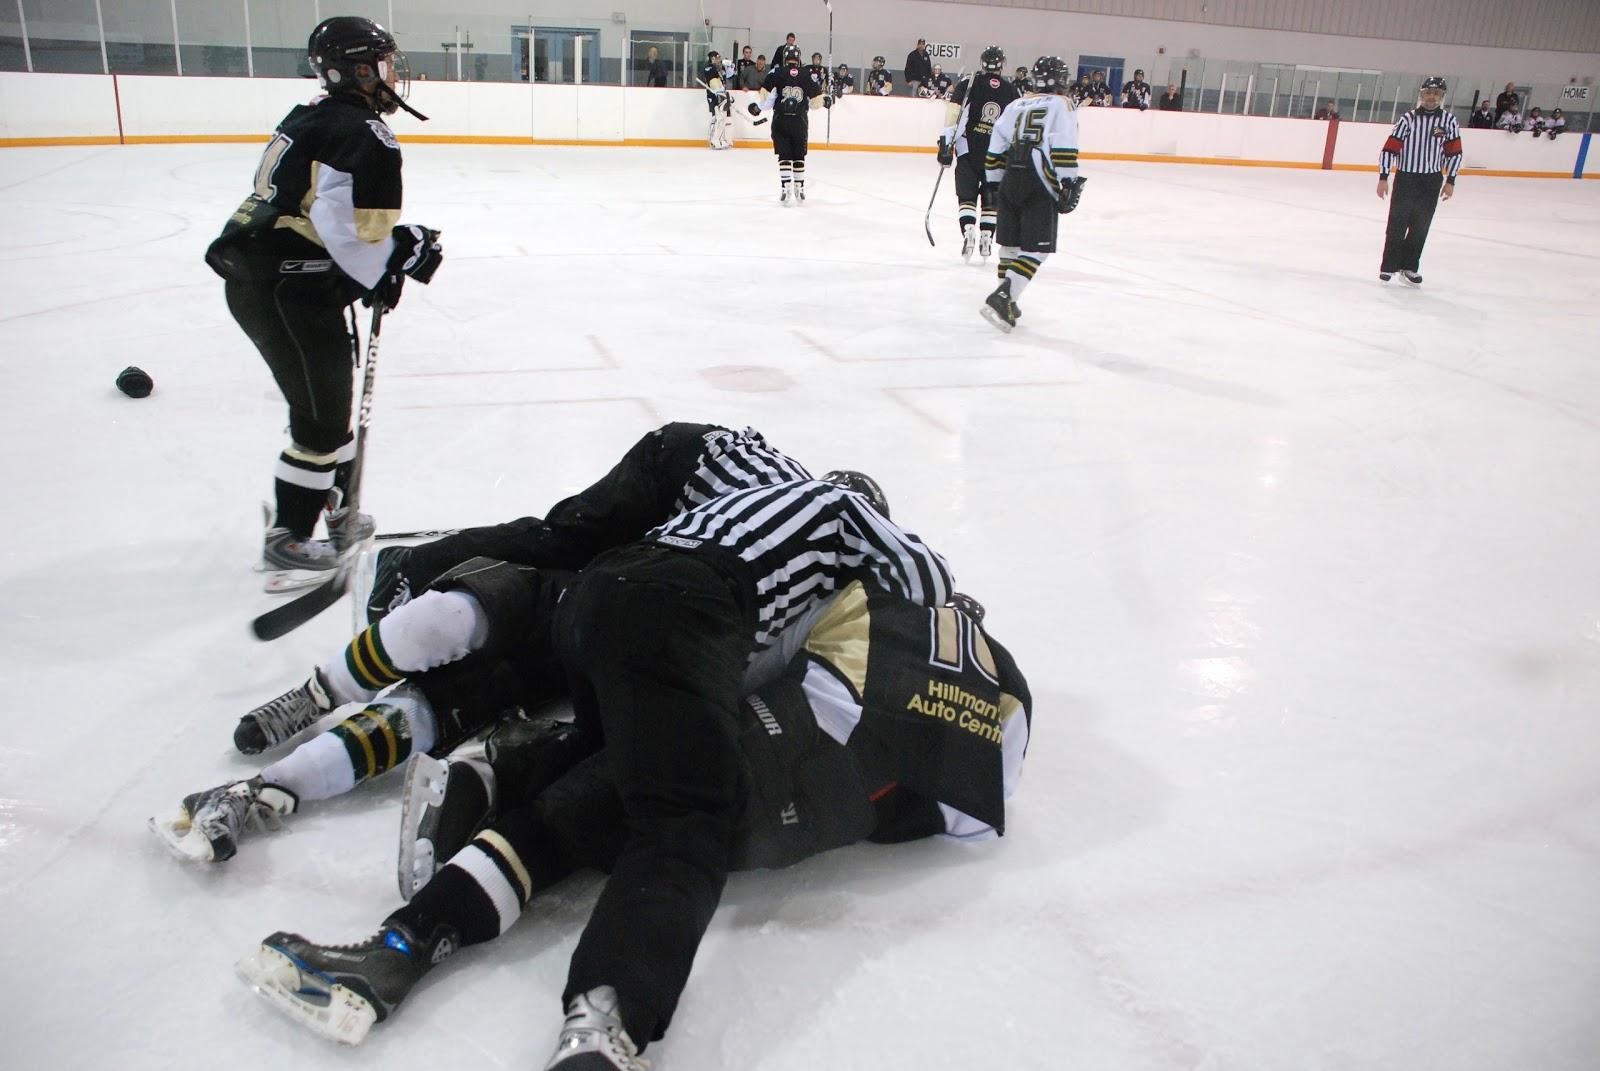 Midget hockey fight images 342